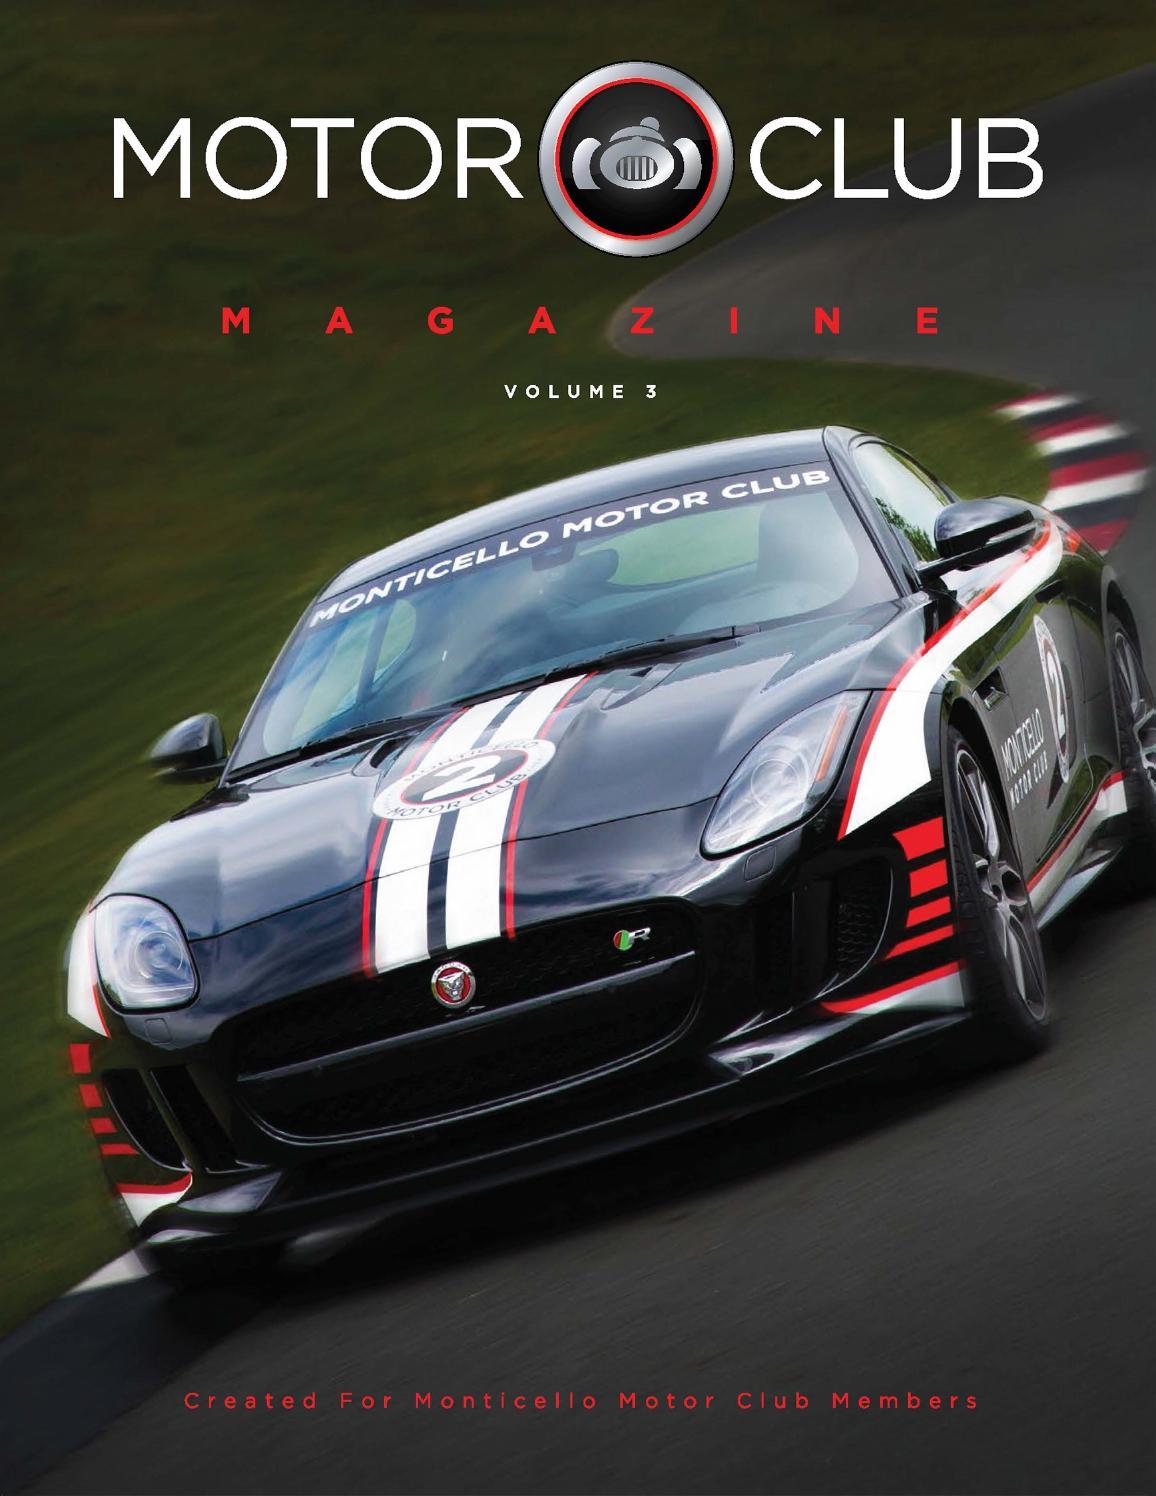 Motor Club Magazine Volume 3 By Monticello Motor Club